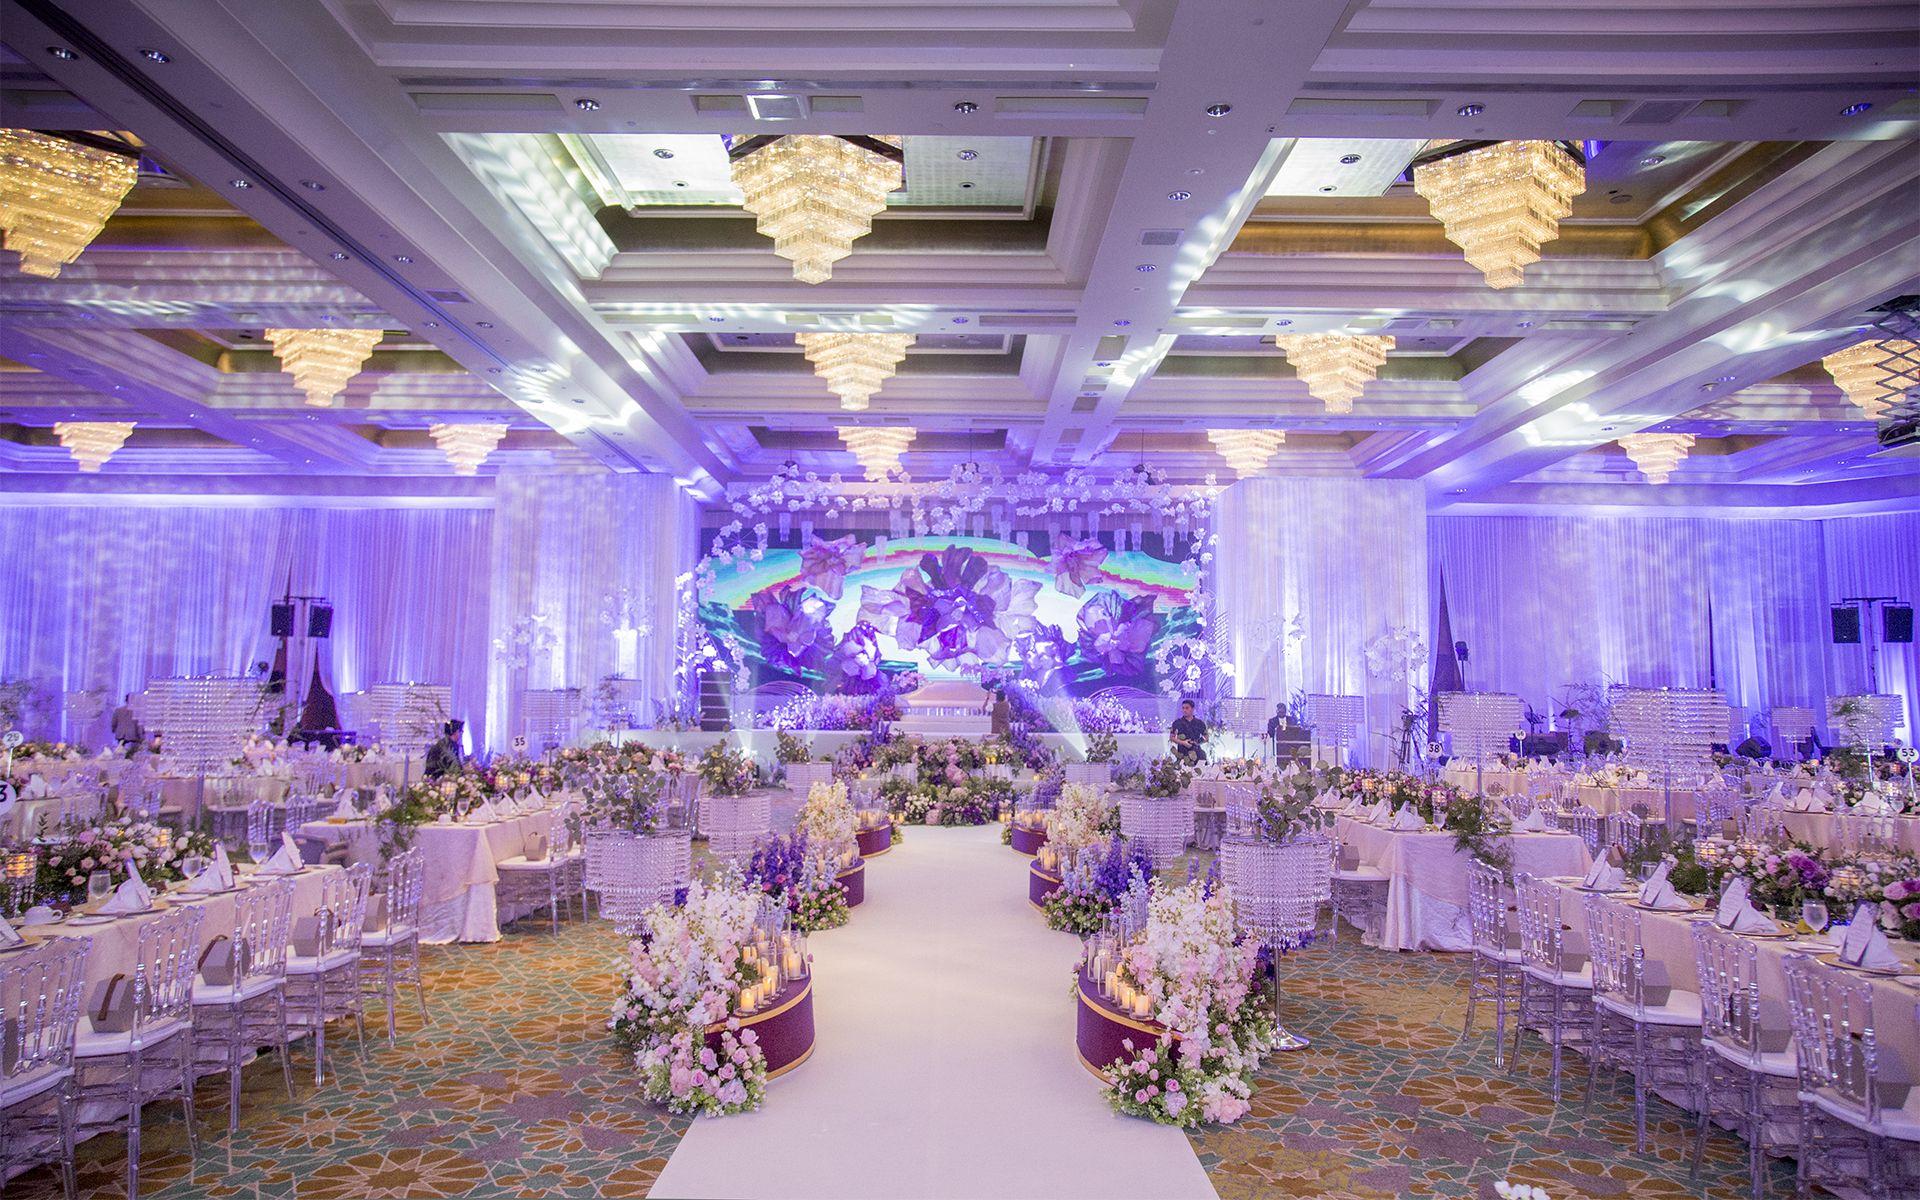 The floral wonderland wedding reception by Reka Teemor